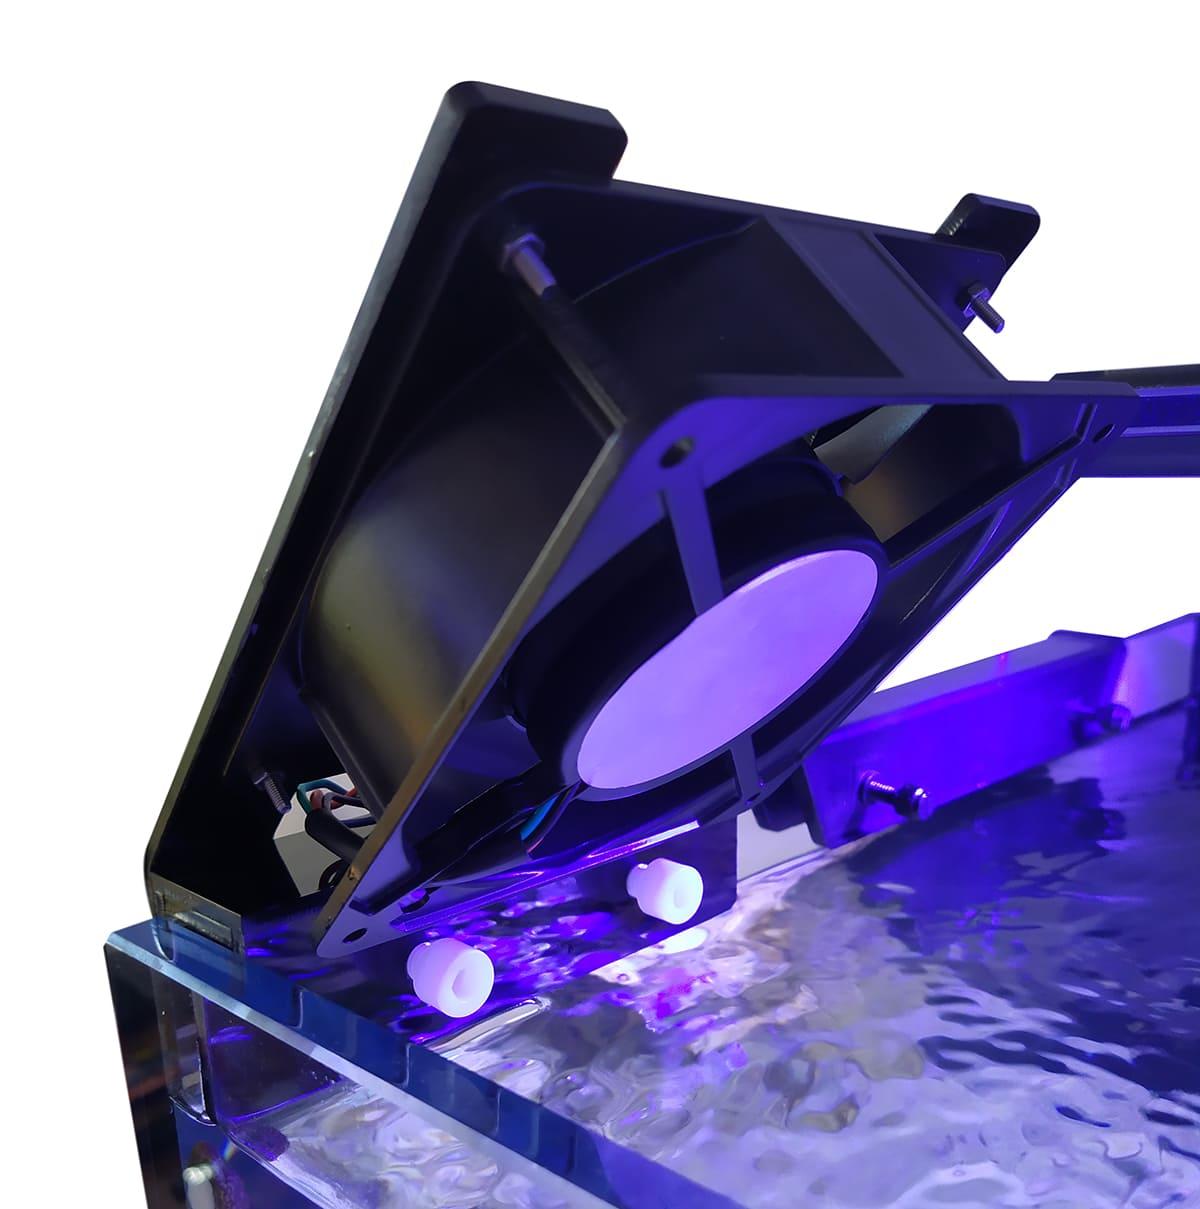 Cooler Resfriador p/ Aquários Trava Francesa / Vidro Simples